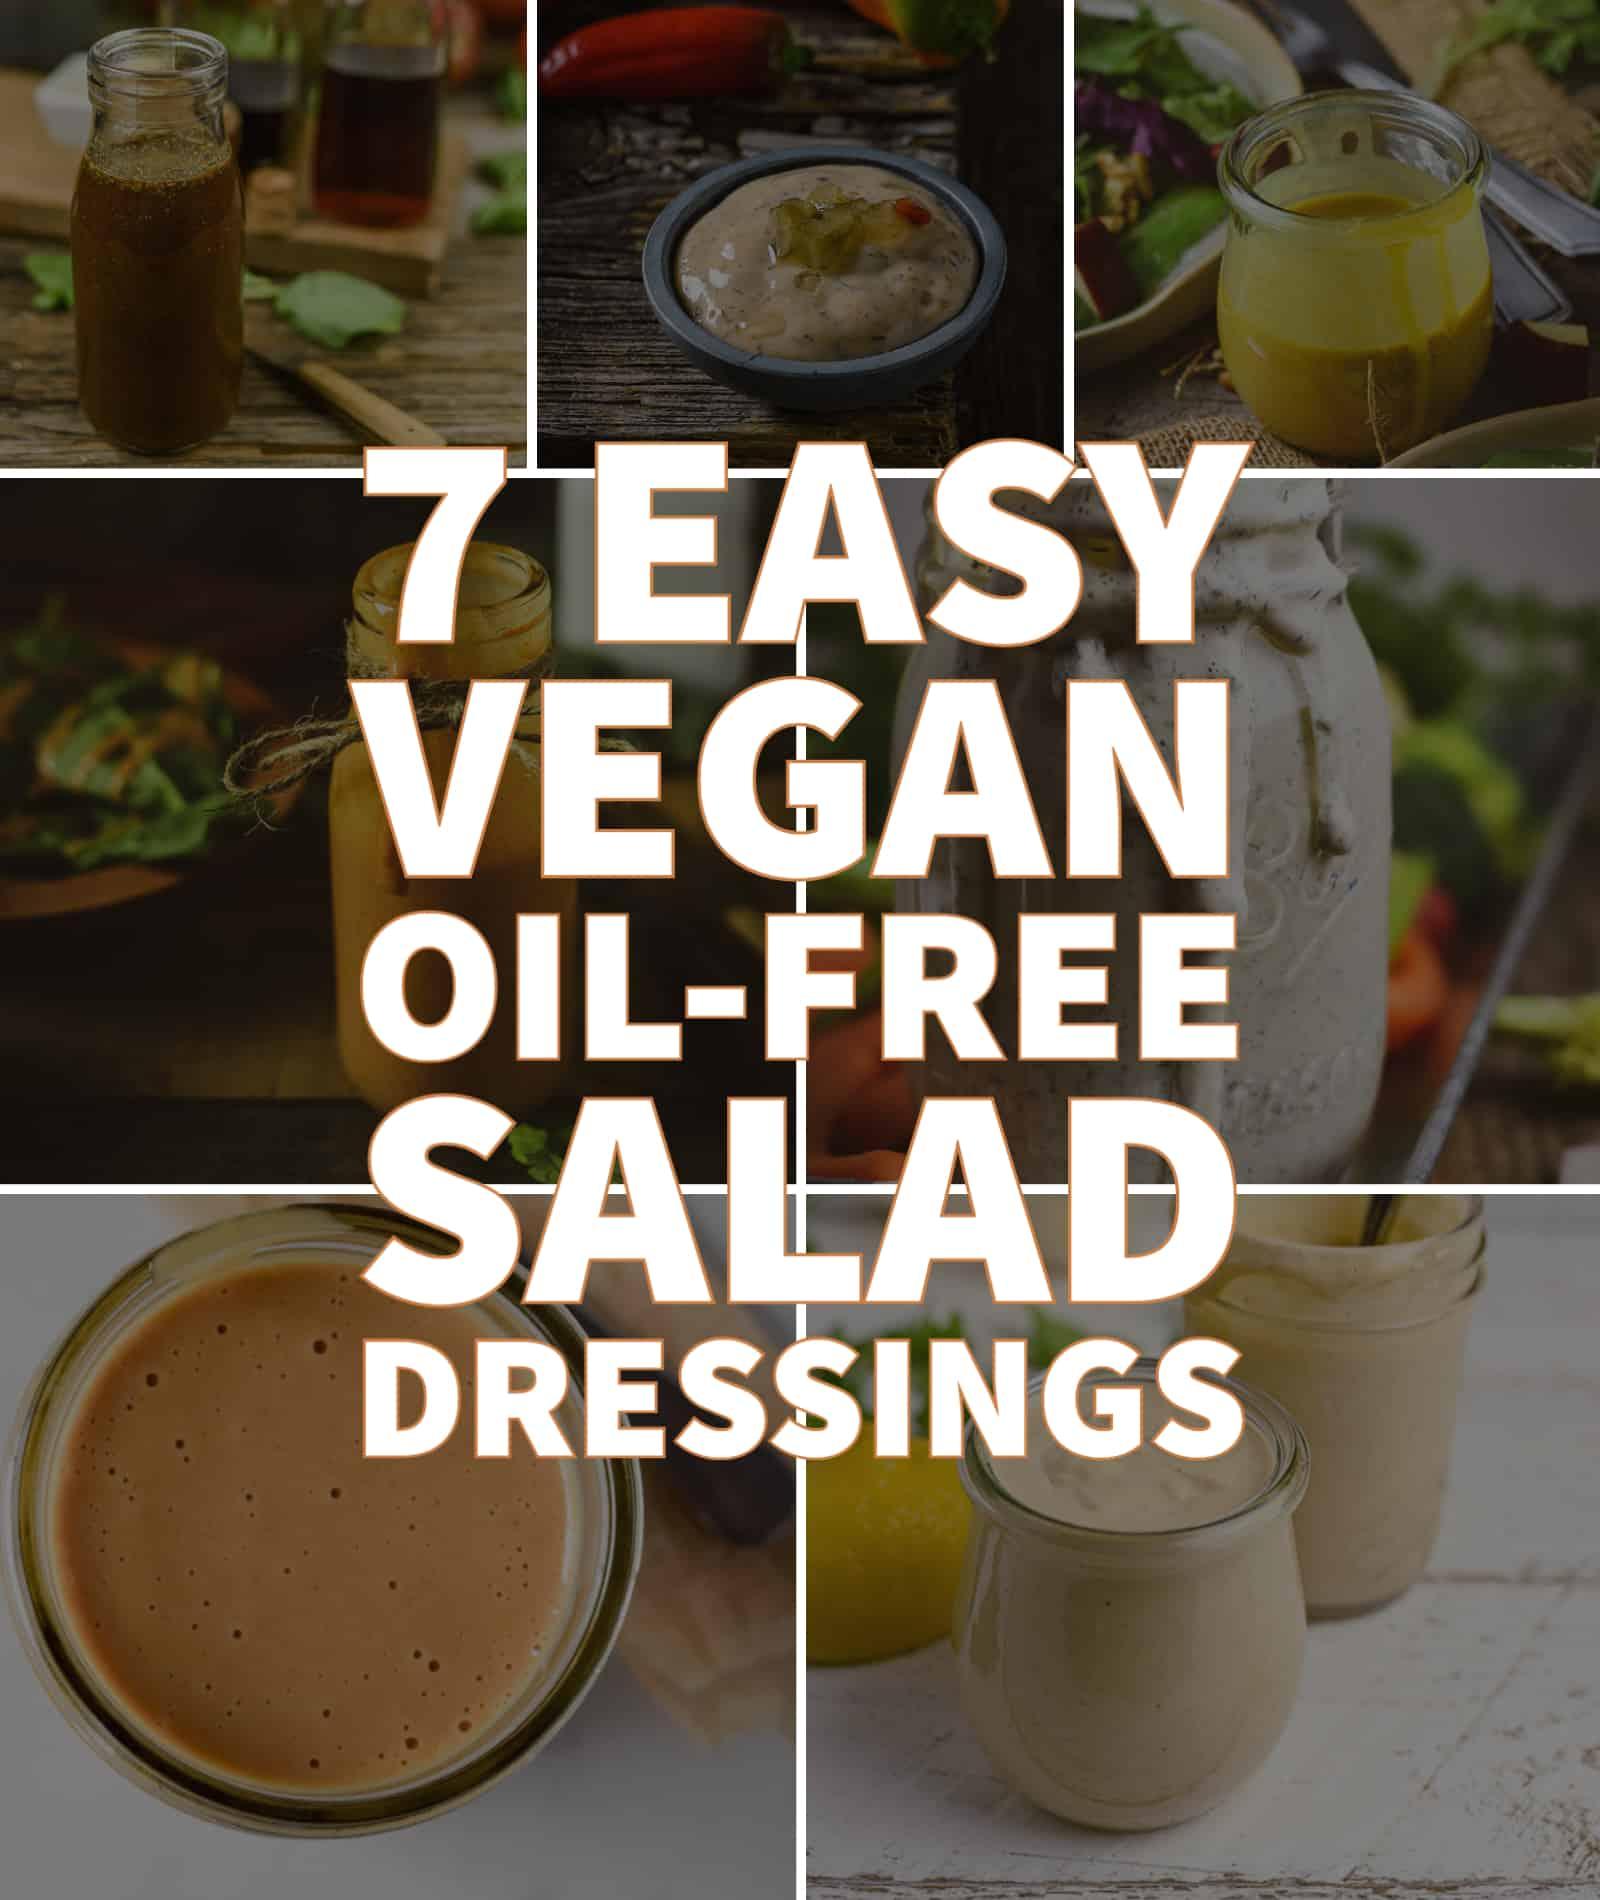 oil-free salad dressing recipes header